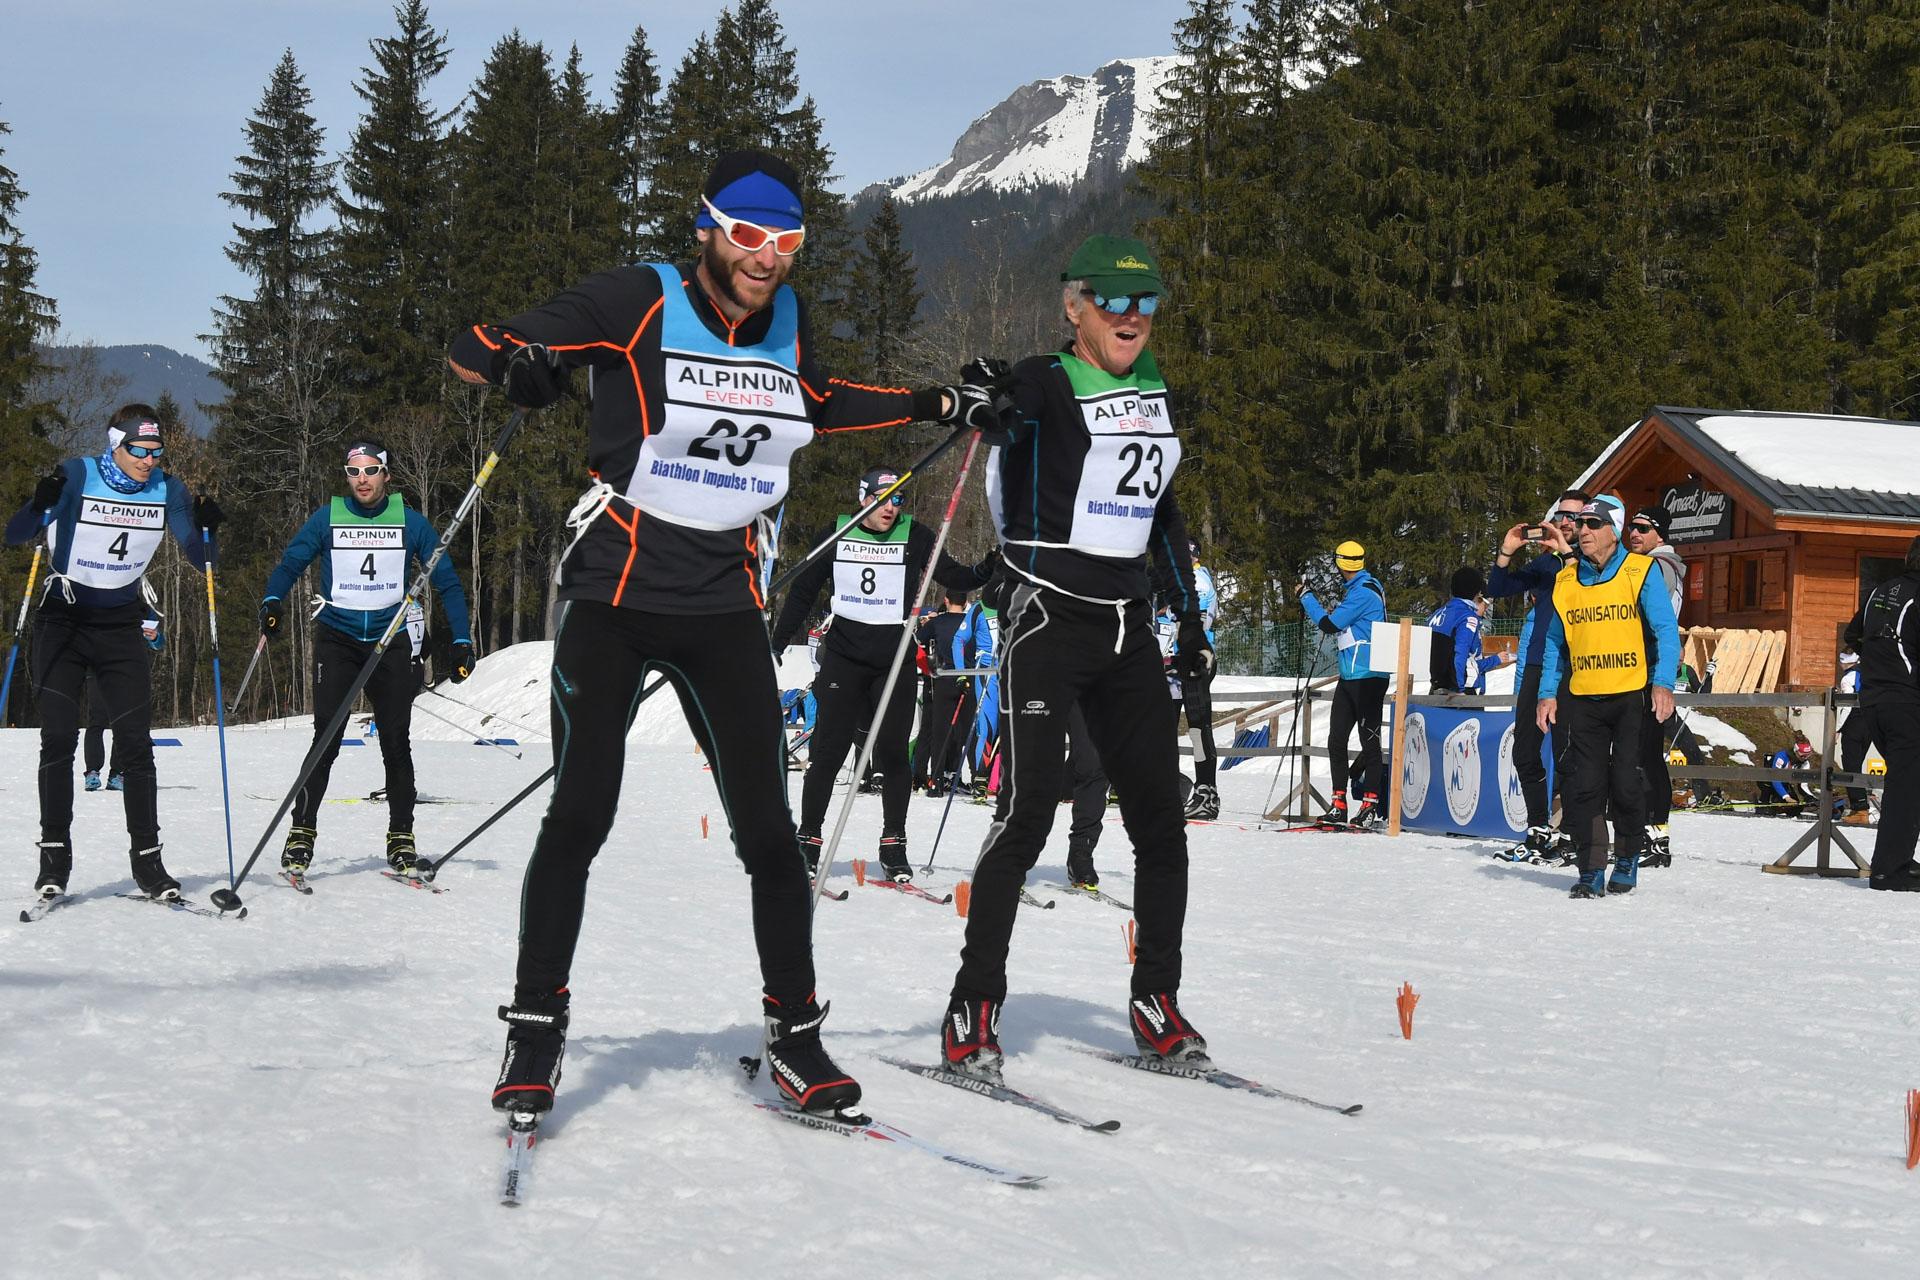 Alpinum-Biathlon-Impulse-Tour-2019©JulieRuly_276